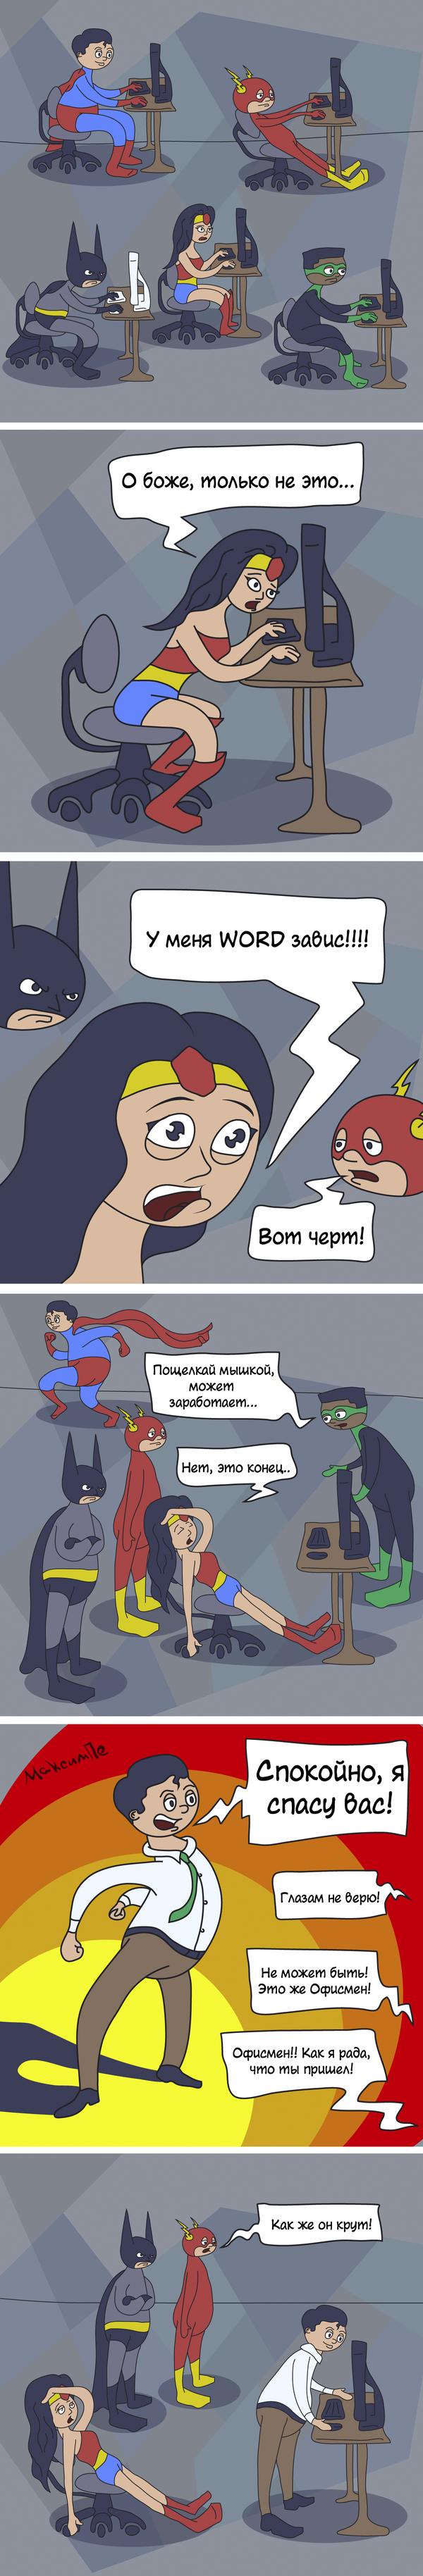 Офис справедливости рисунок, Комиксы, Лига Справедливости, Супермен, бэтмен, офис, длиннопост